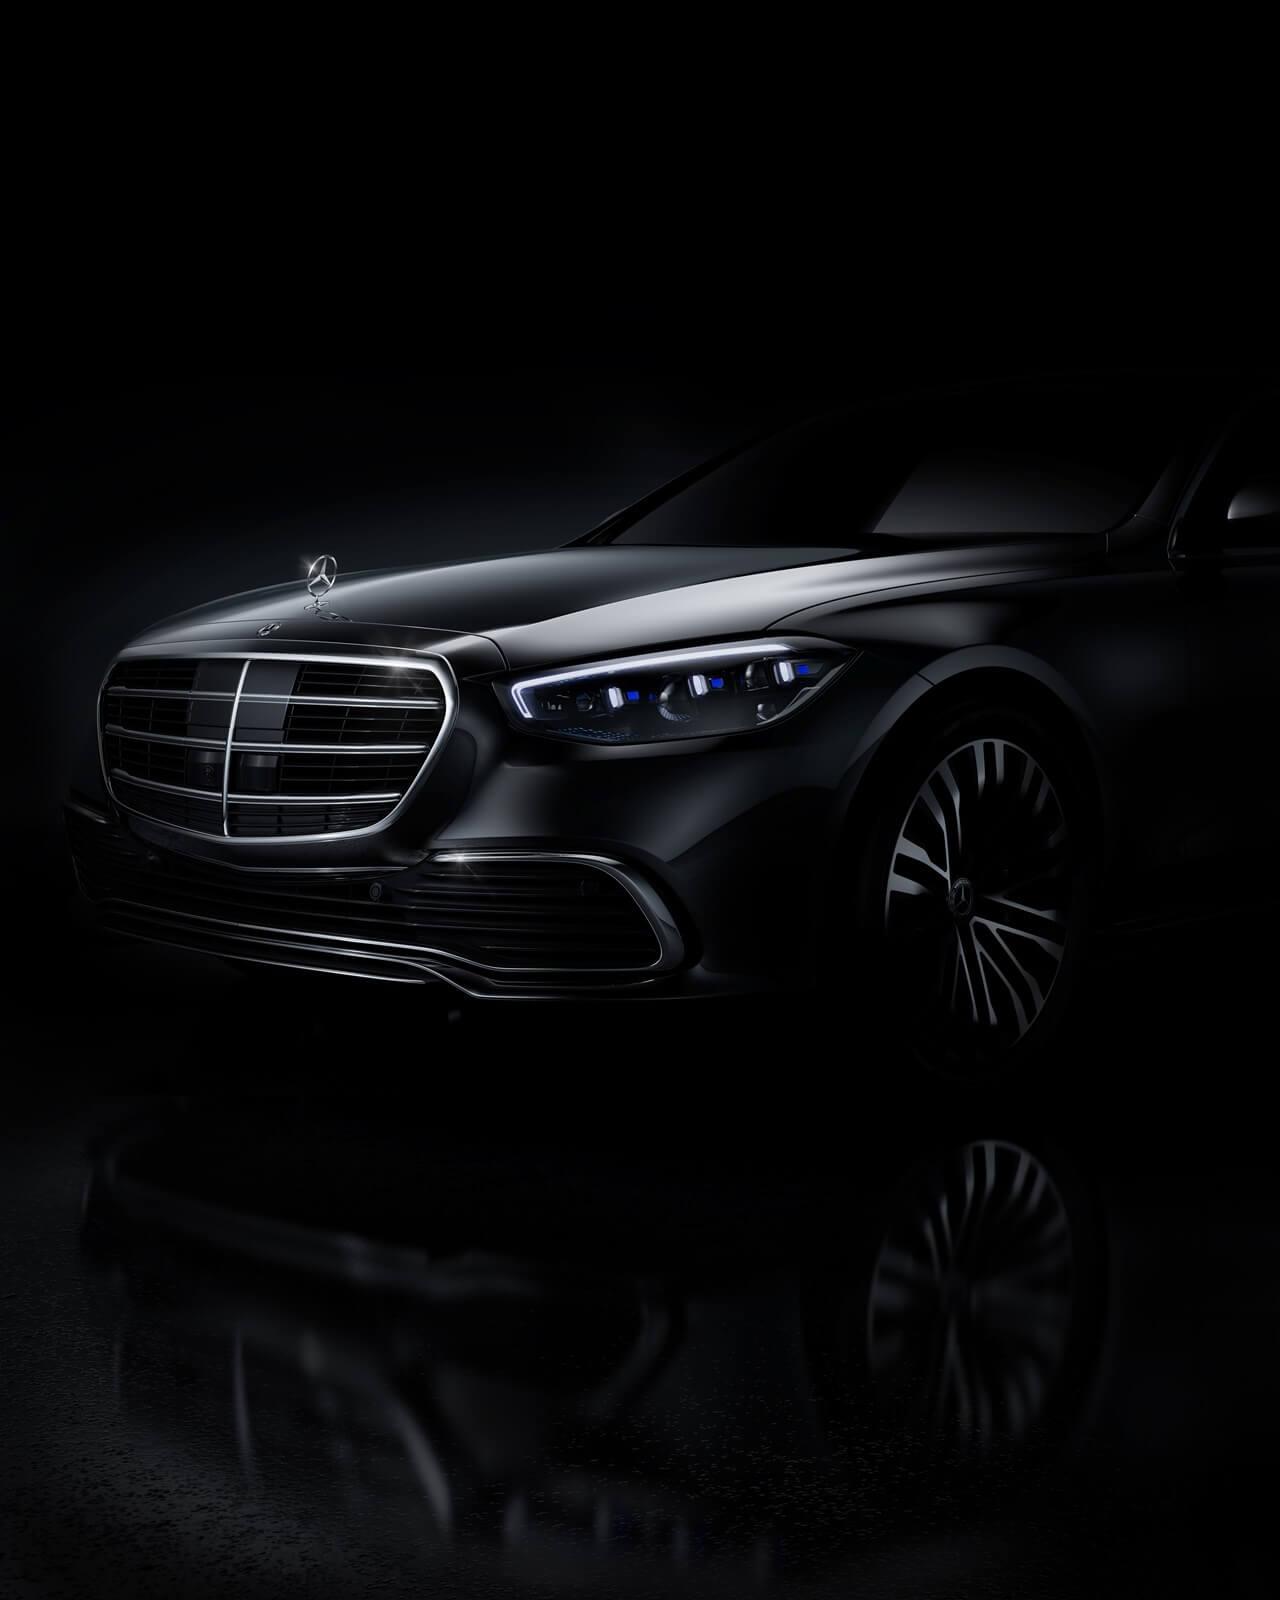 Mercedes-Benz Classe S 2020